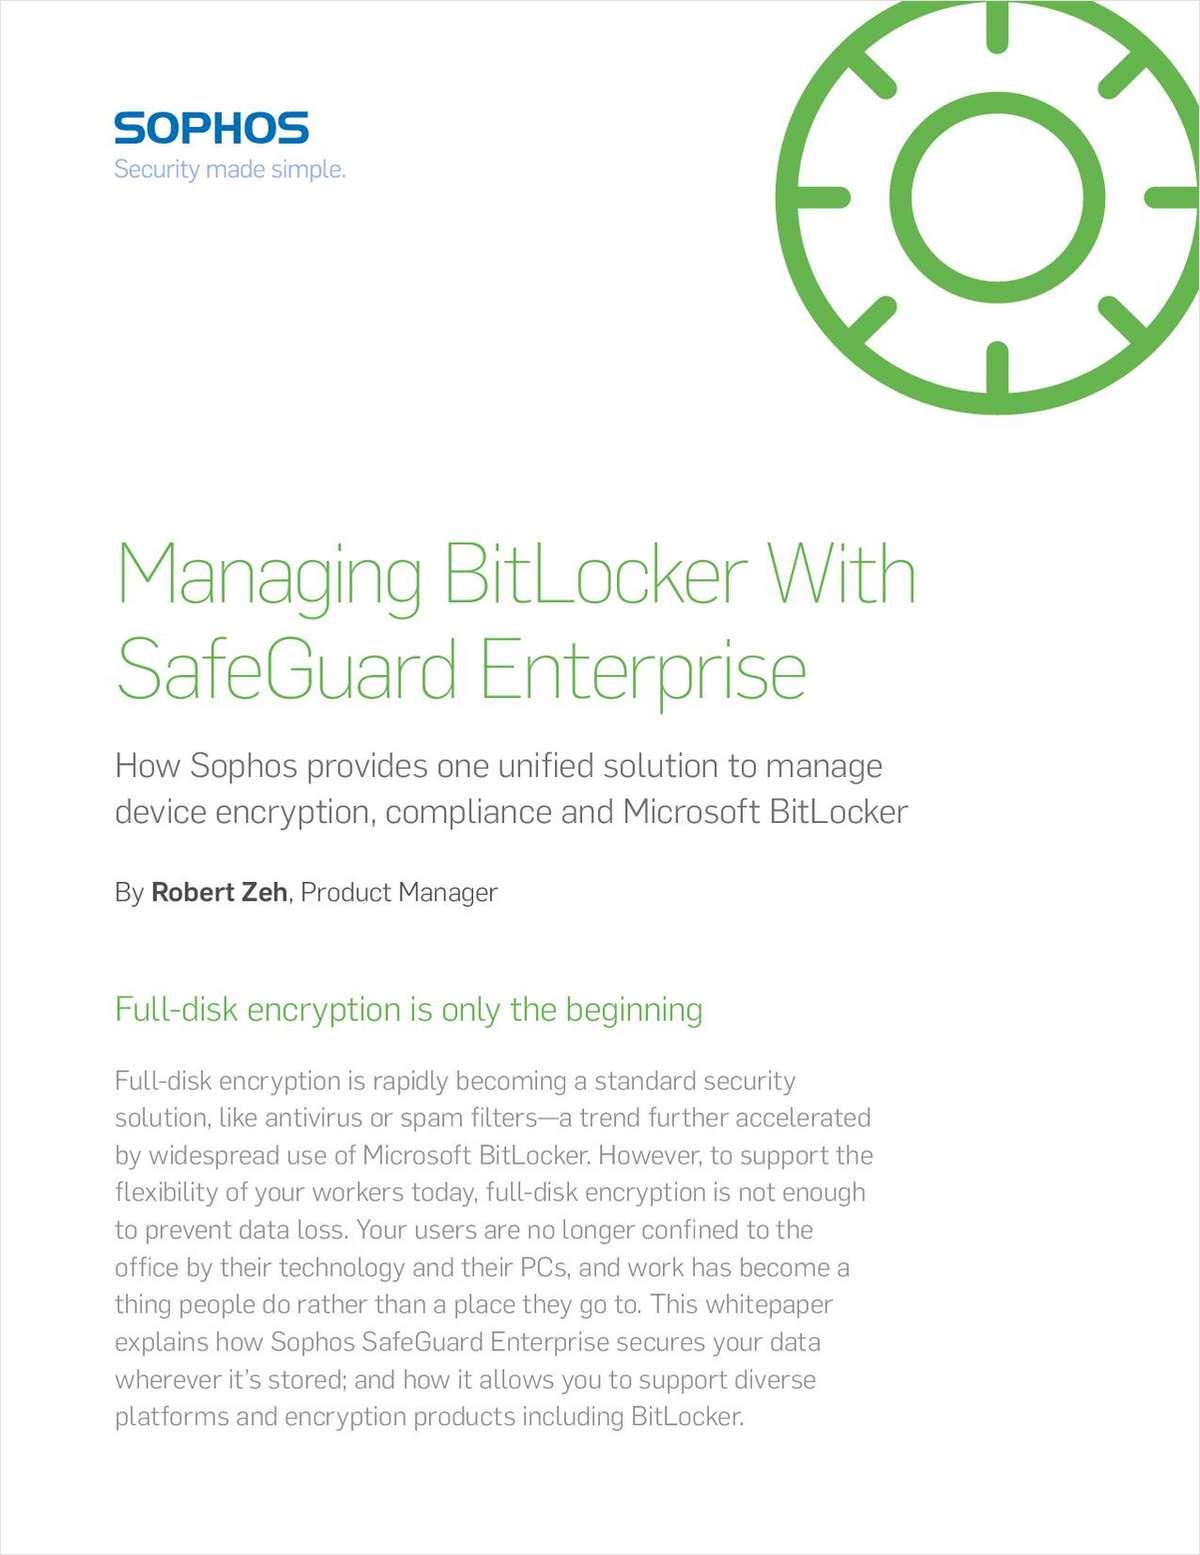 Managing BitLocker with SafeGuard Enterprise